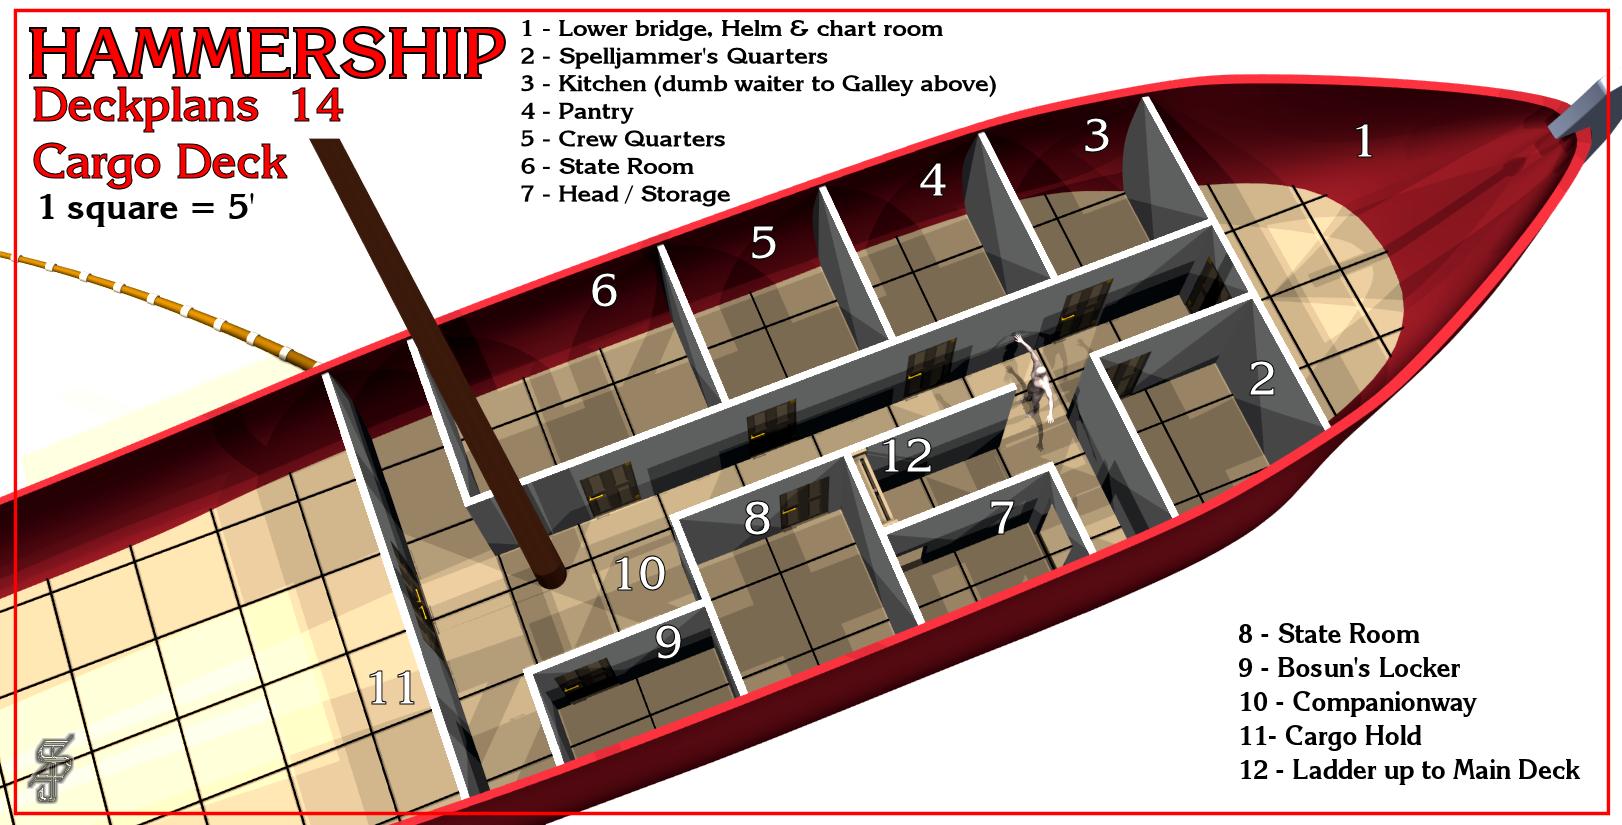 Hammership layout 14